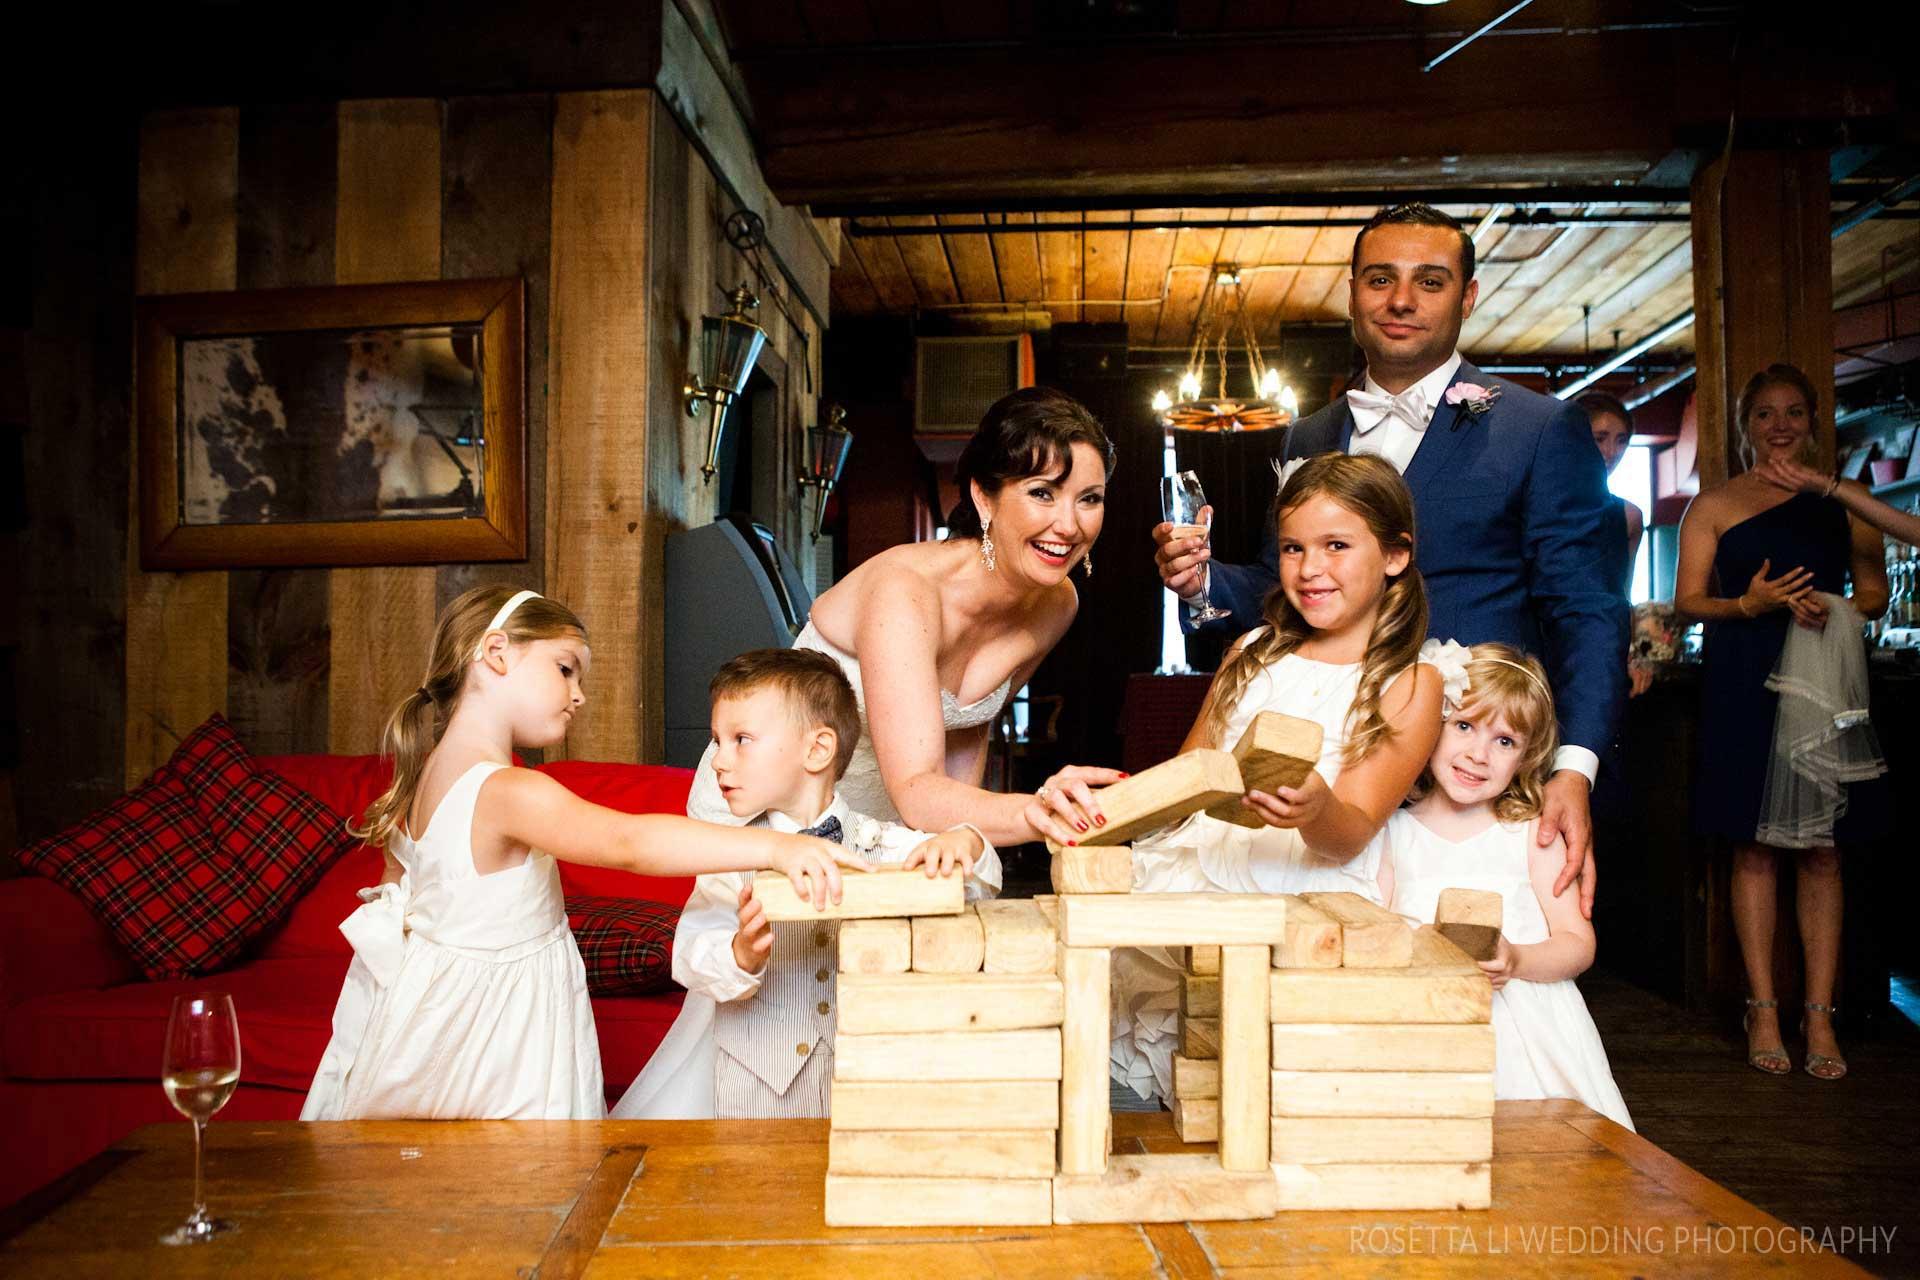 Unique Wedding Venues Toronto - Cocktail Hour - Wedding Party